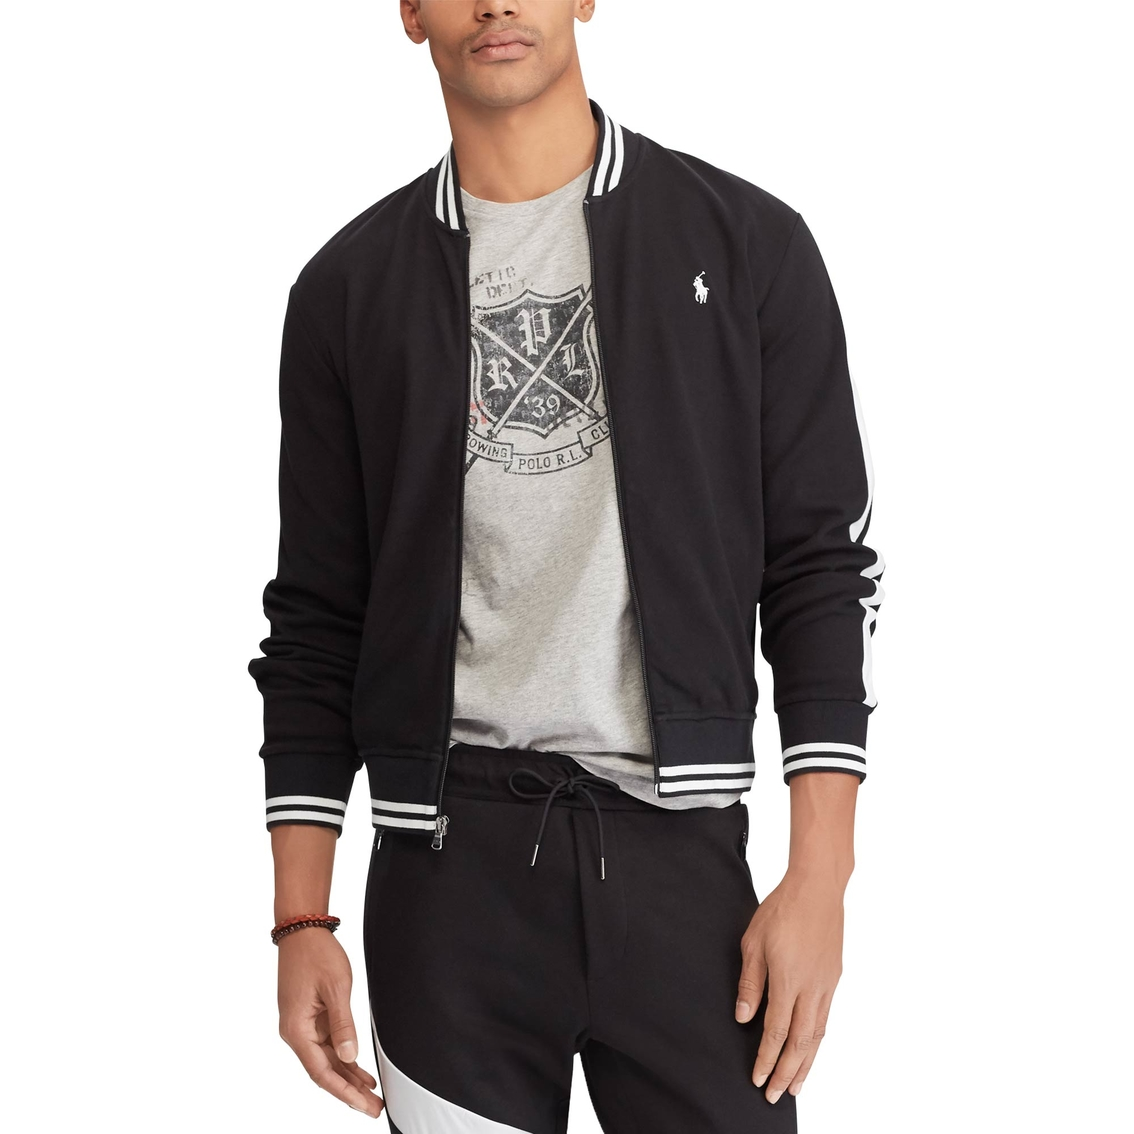 Polo Ralph Lauren Cotton Baseball Jacket   Jackets   Apparel   Shop ... c9388c3ed03e